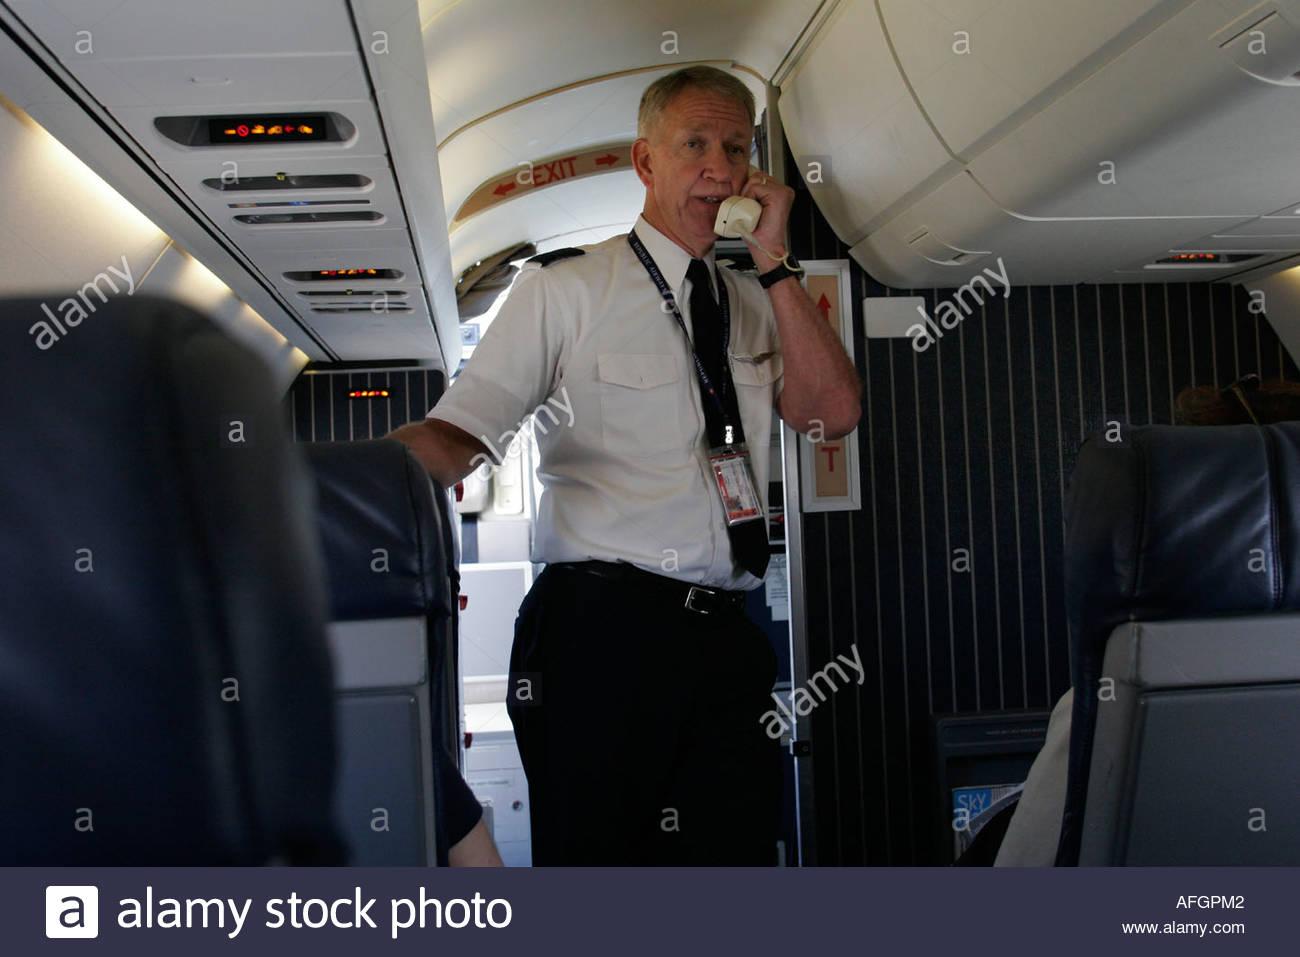 Orlando Florida Airport Delta commuter - 107.2KB